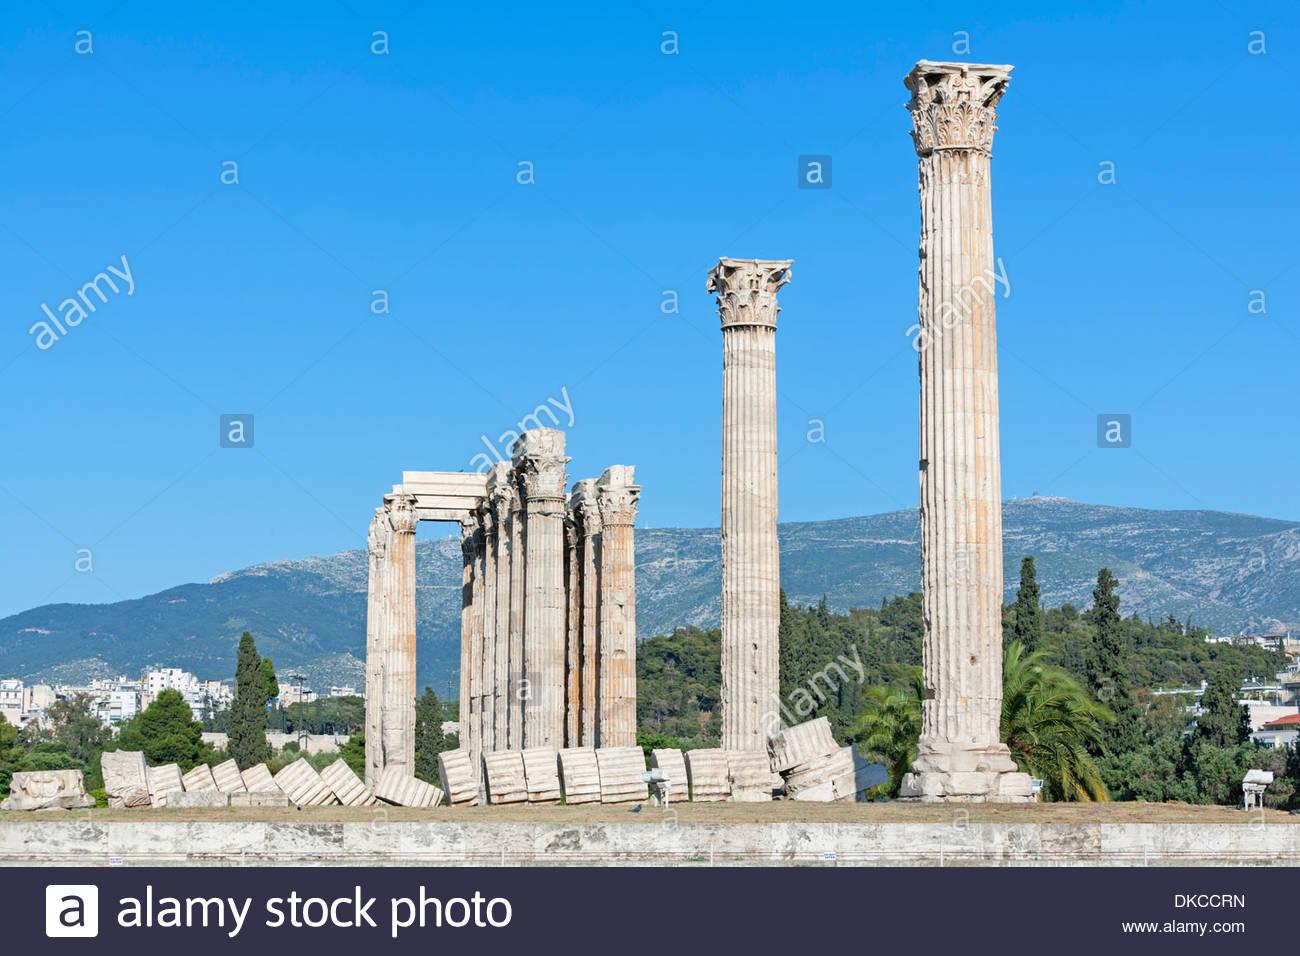 Temple of Olympian Zeus, Athens, Greece, Europe - Stock Image